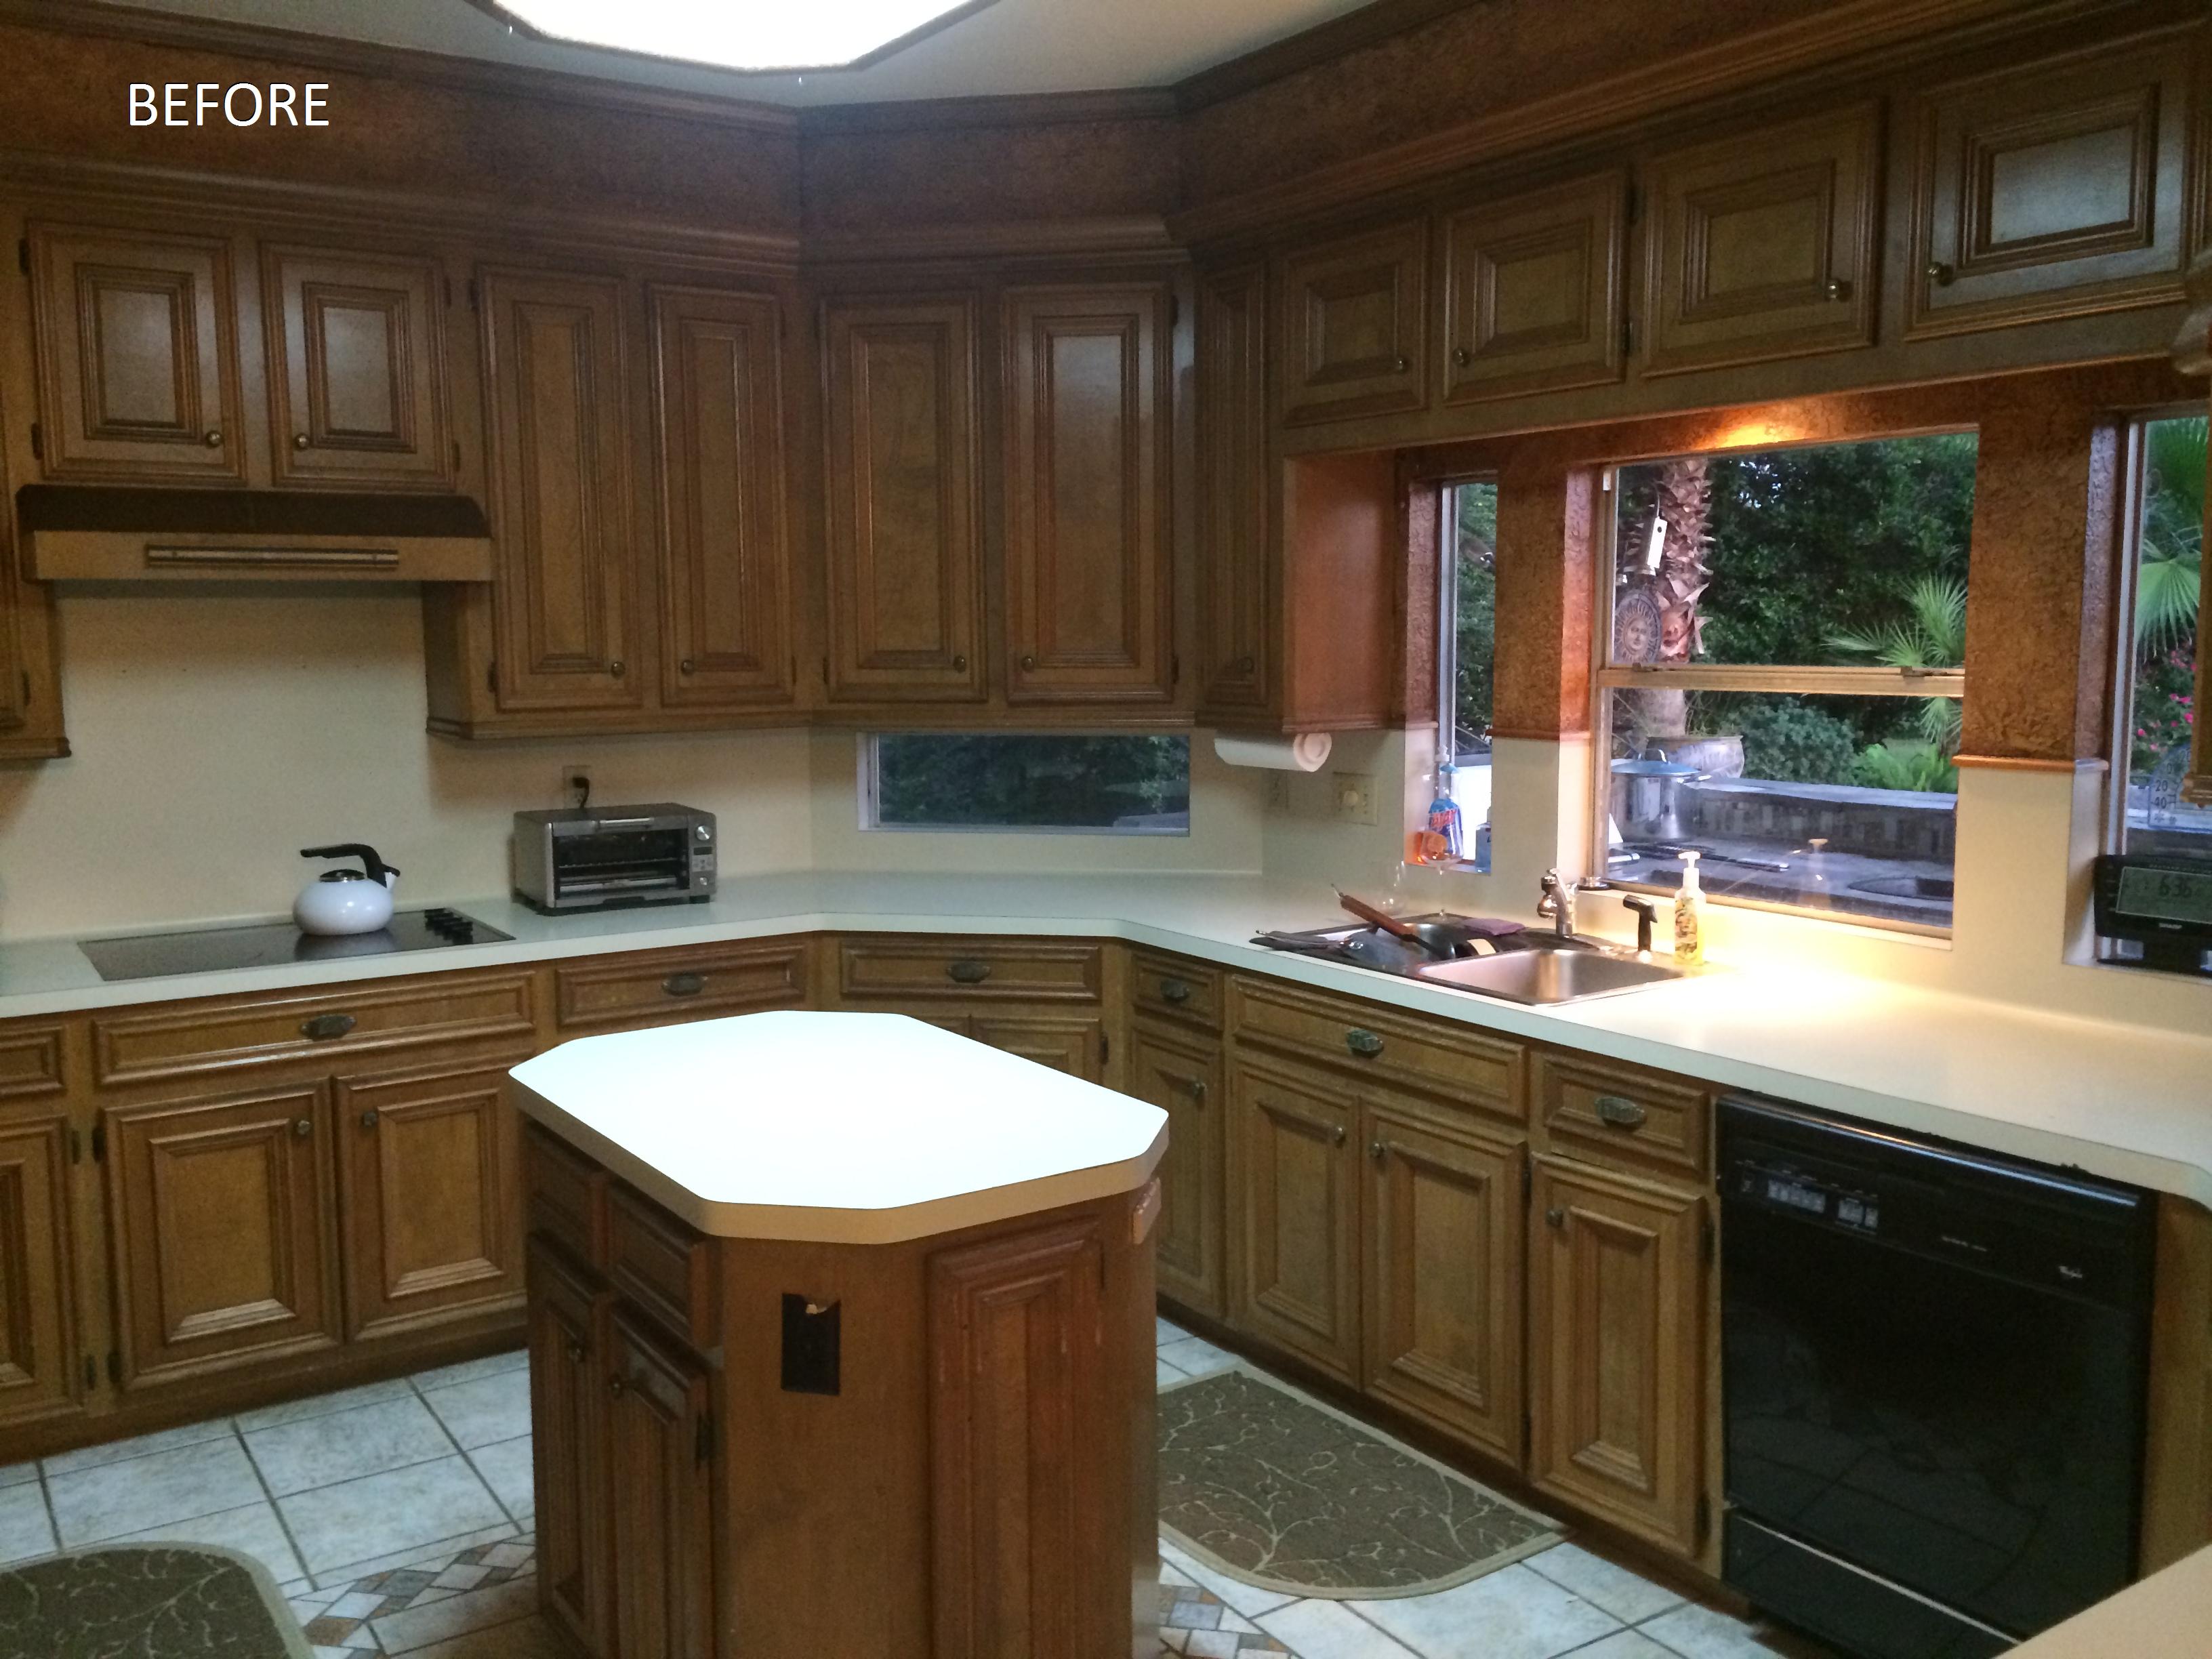 Kitchen Remodeling Houston Tx Interior Design And Remodeling Houston Tx